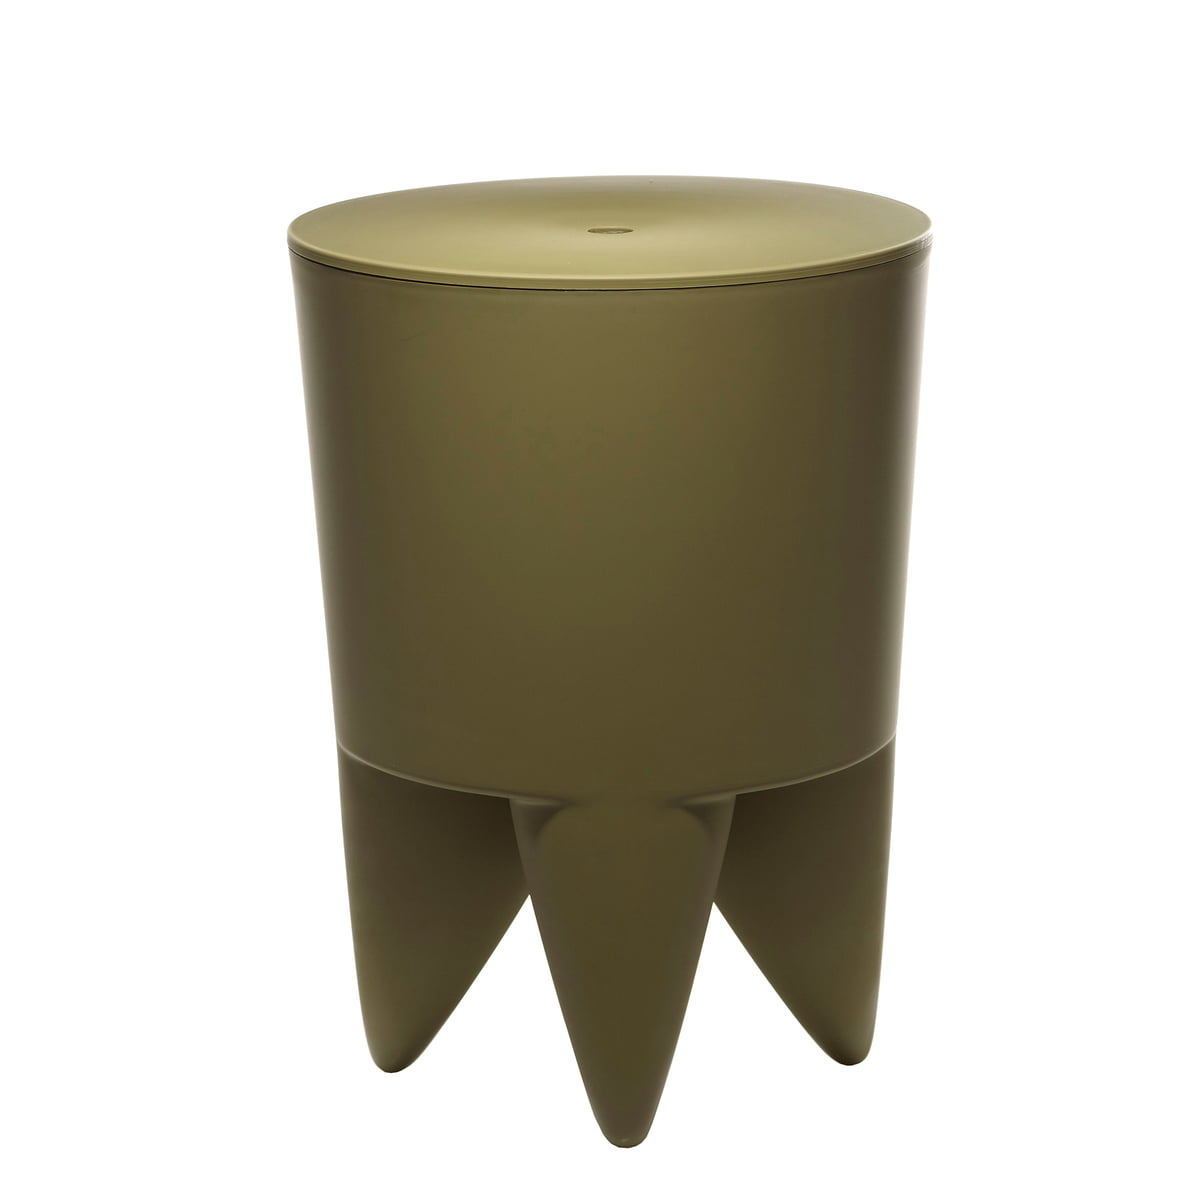 Bubu 1 Stool By Xo Design In The Shop